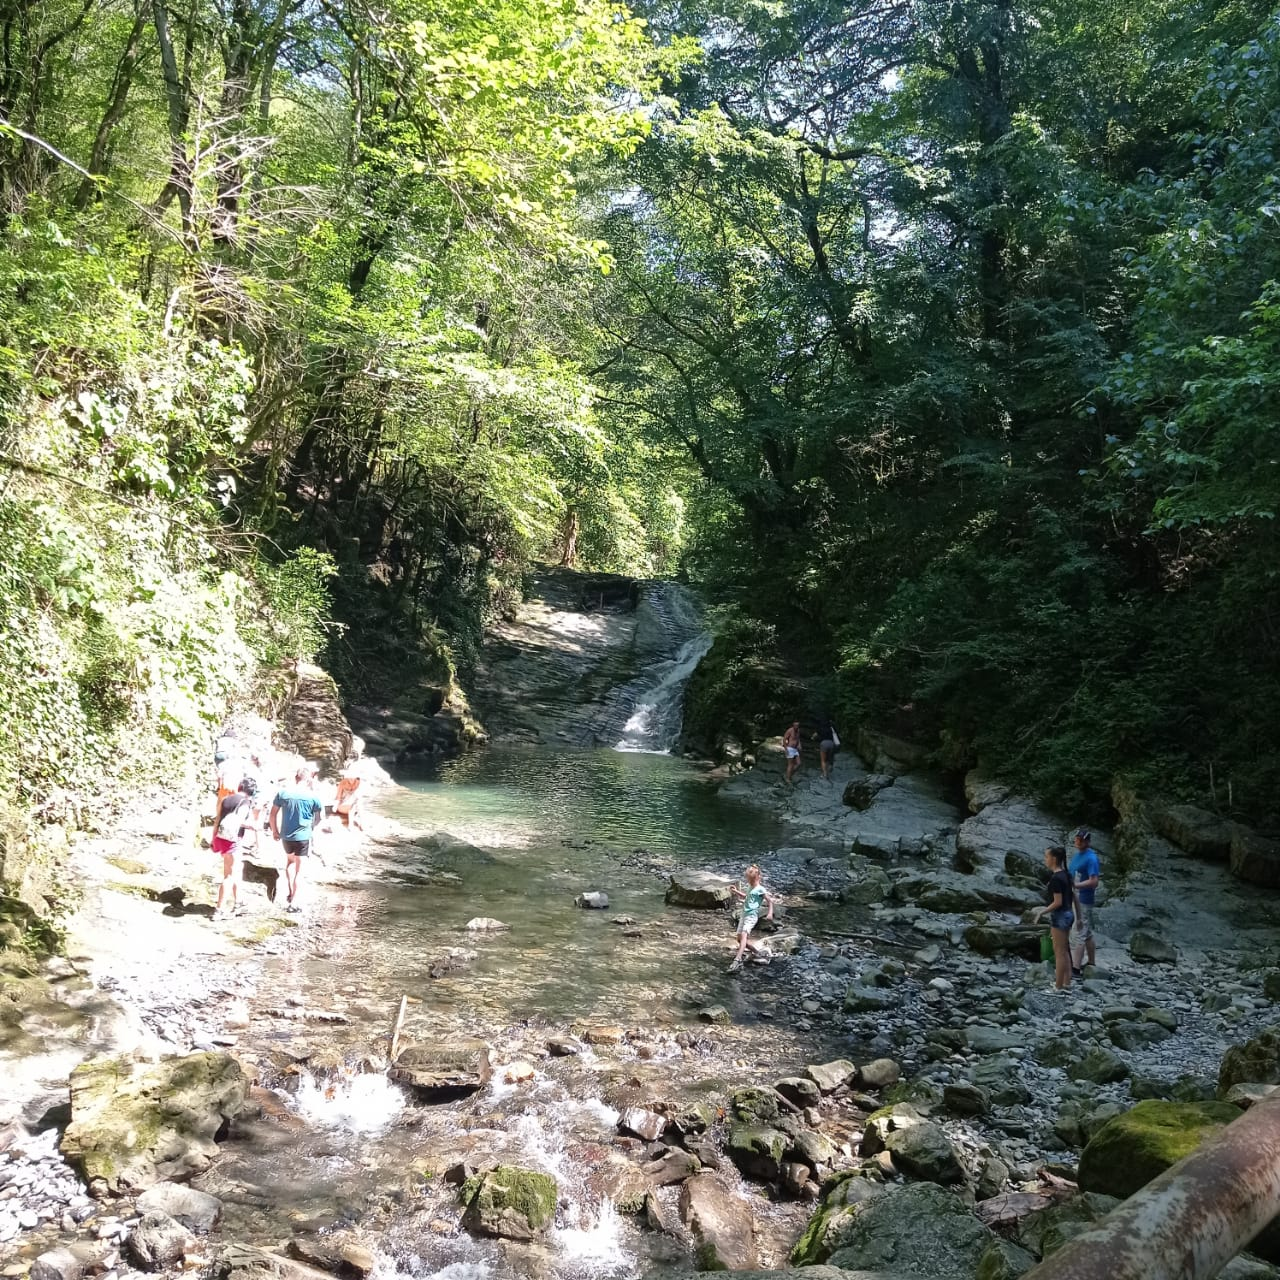 Артур, Арут, Джиппинг Вардане 33 водопада, цены, маршруты, описание